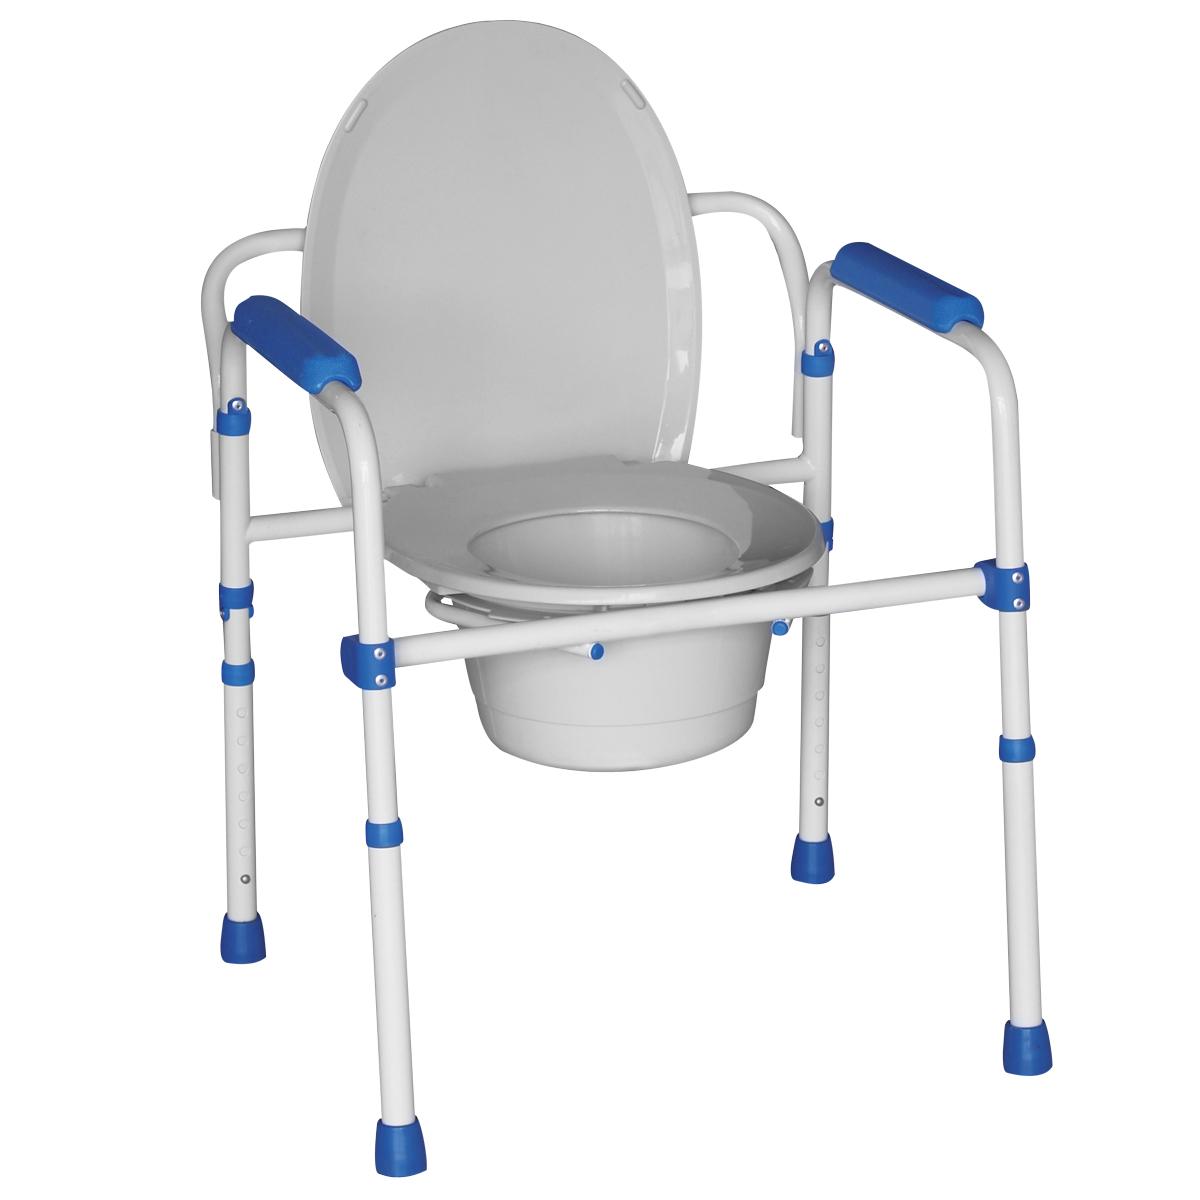 oxypharm chaise toilette 3 en 1 pliante. Black Bedroom Furniture Sets. Home Design Ideas